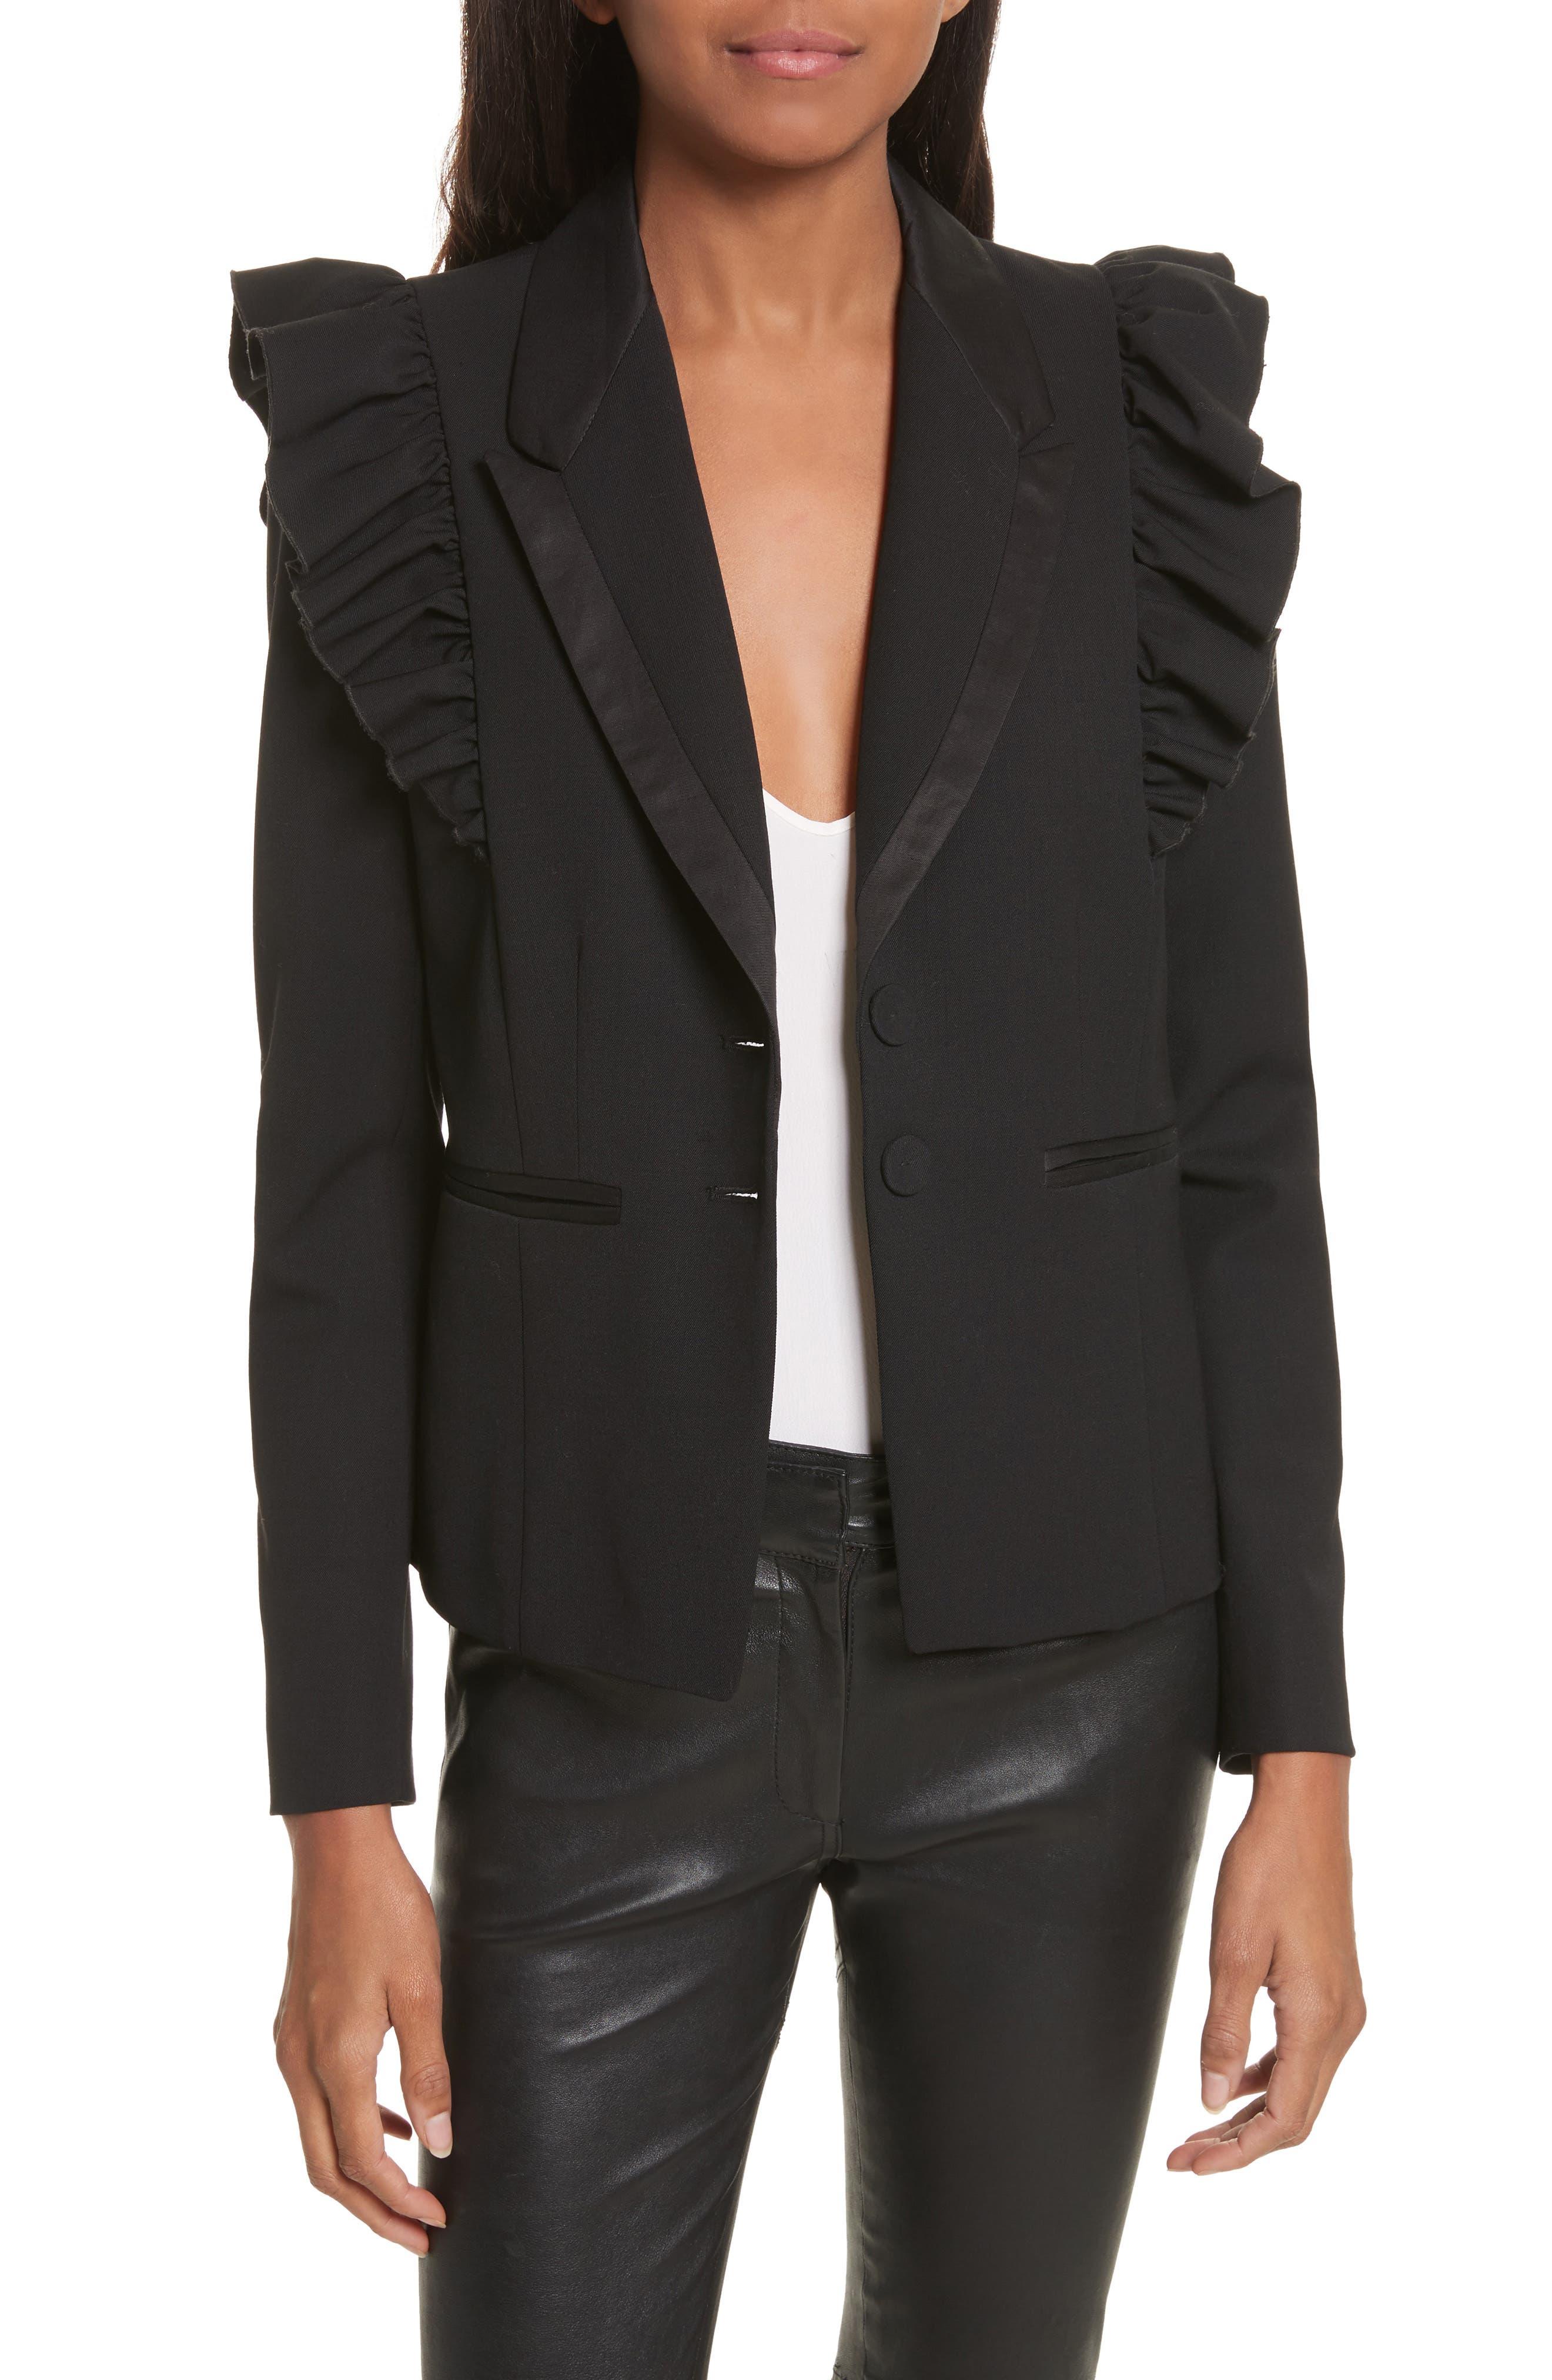 Alternate Image 1 Selected - Rebecca Taylor Ruffle Stretch Wool Jacket